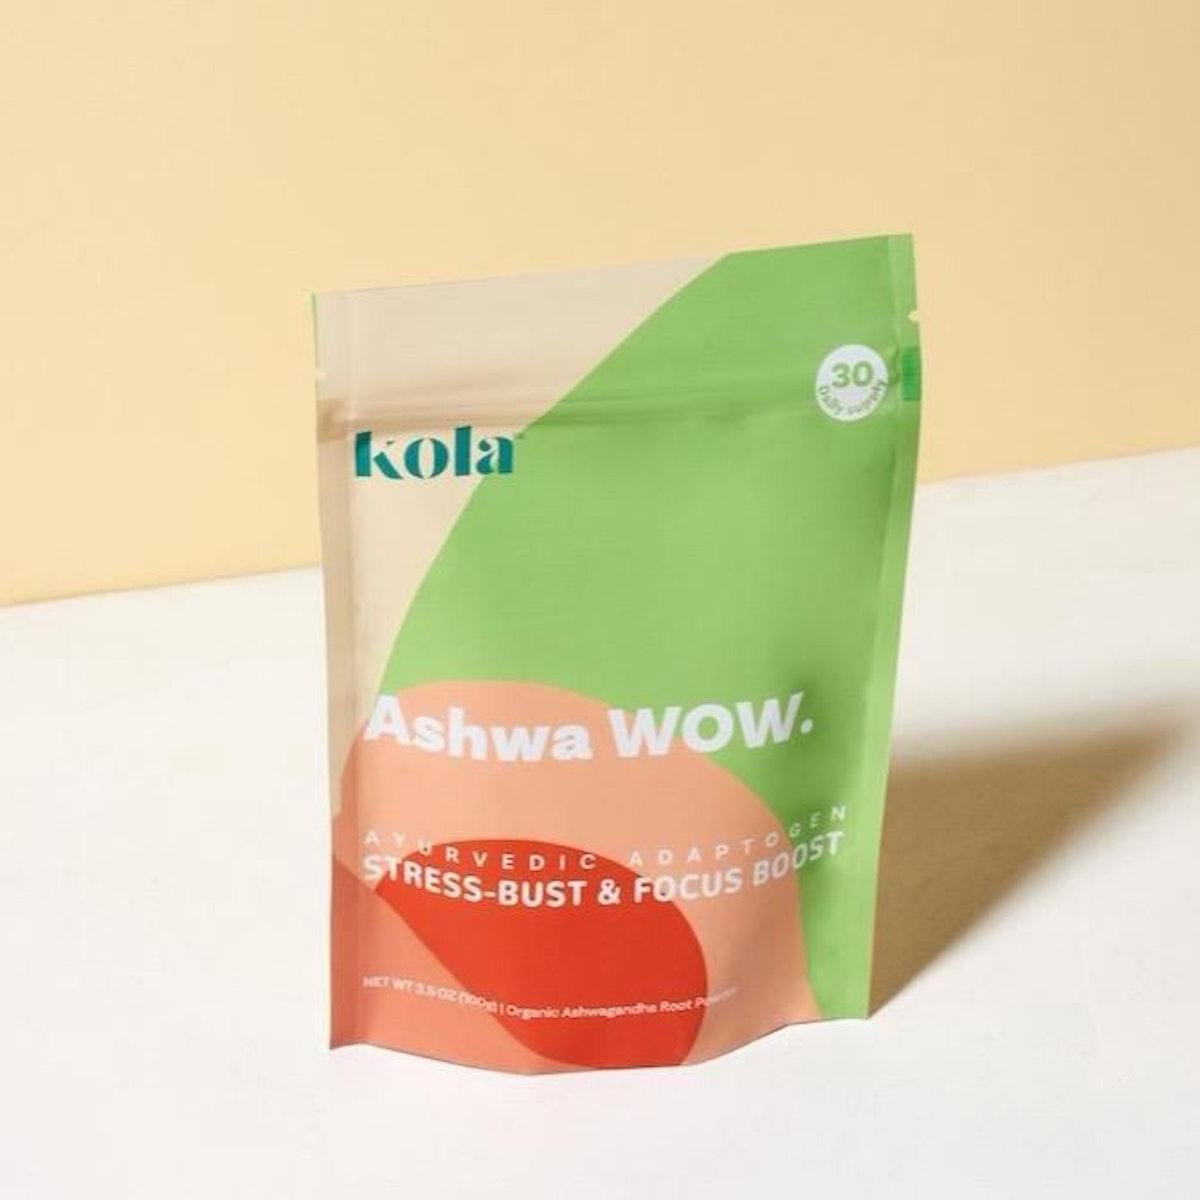 Ashwa-WOW: image 1